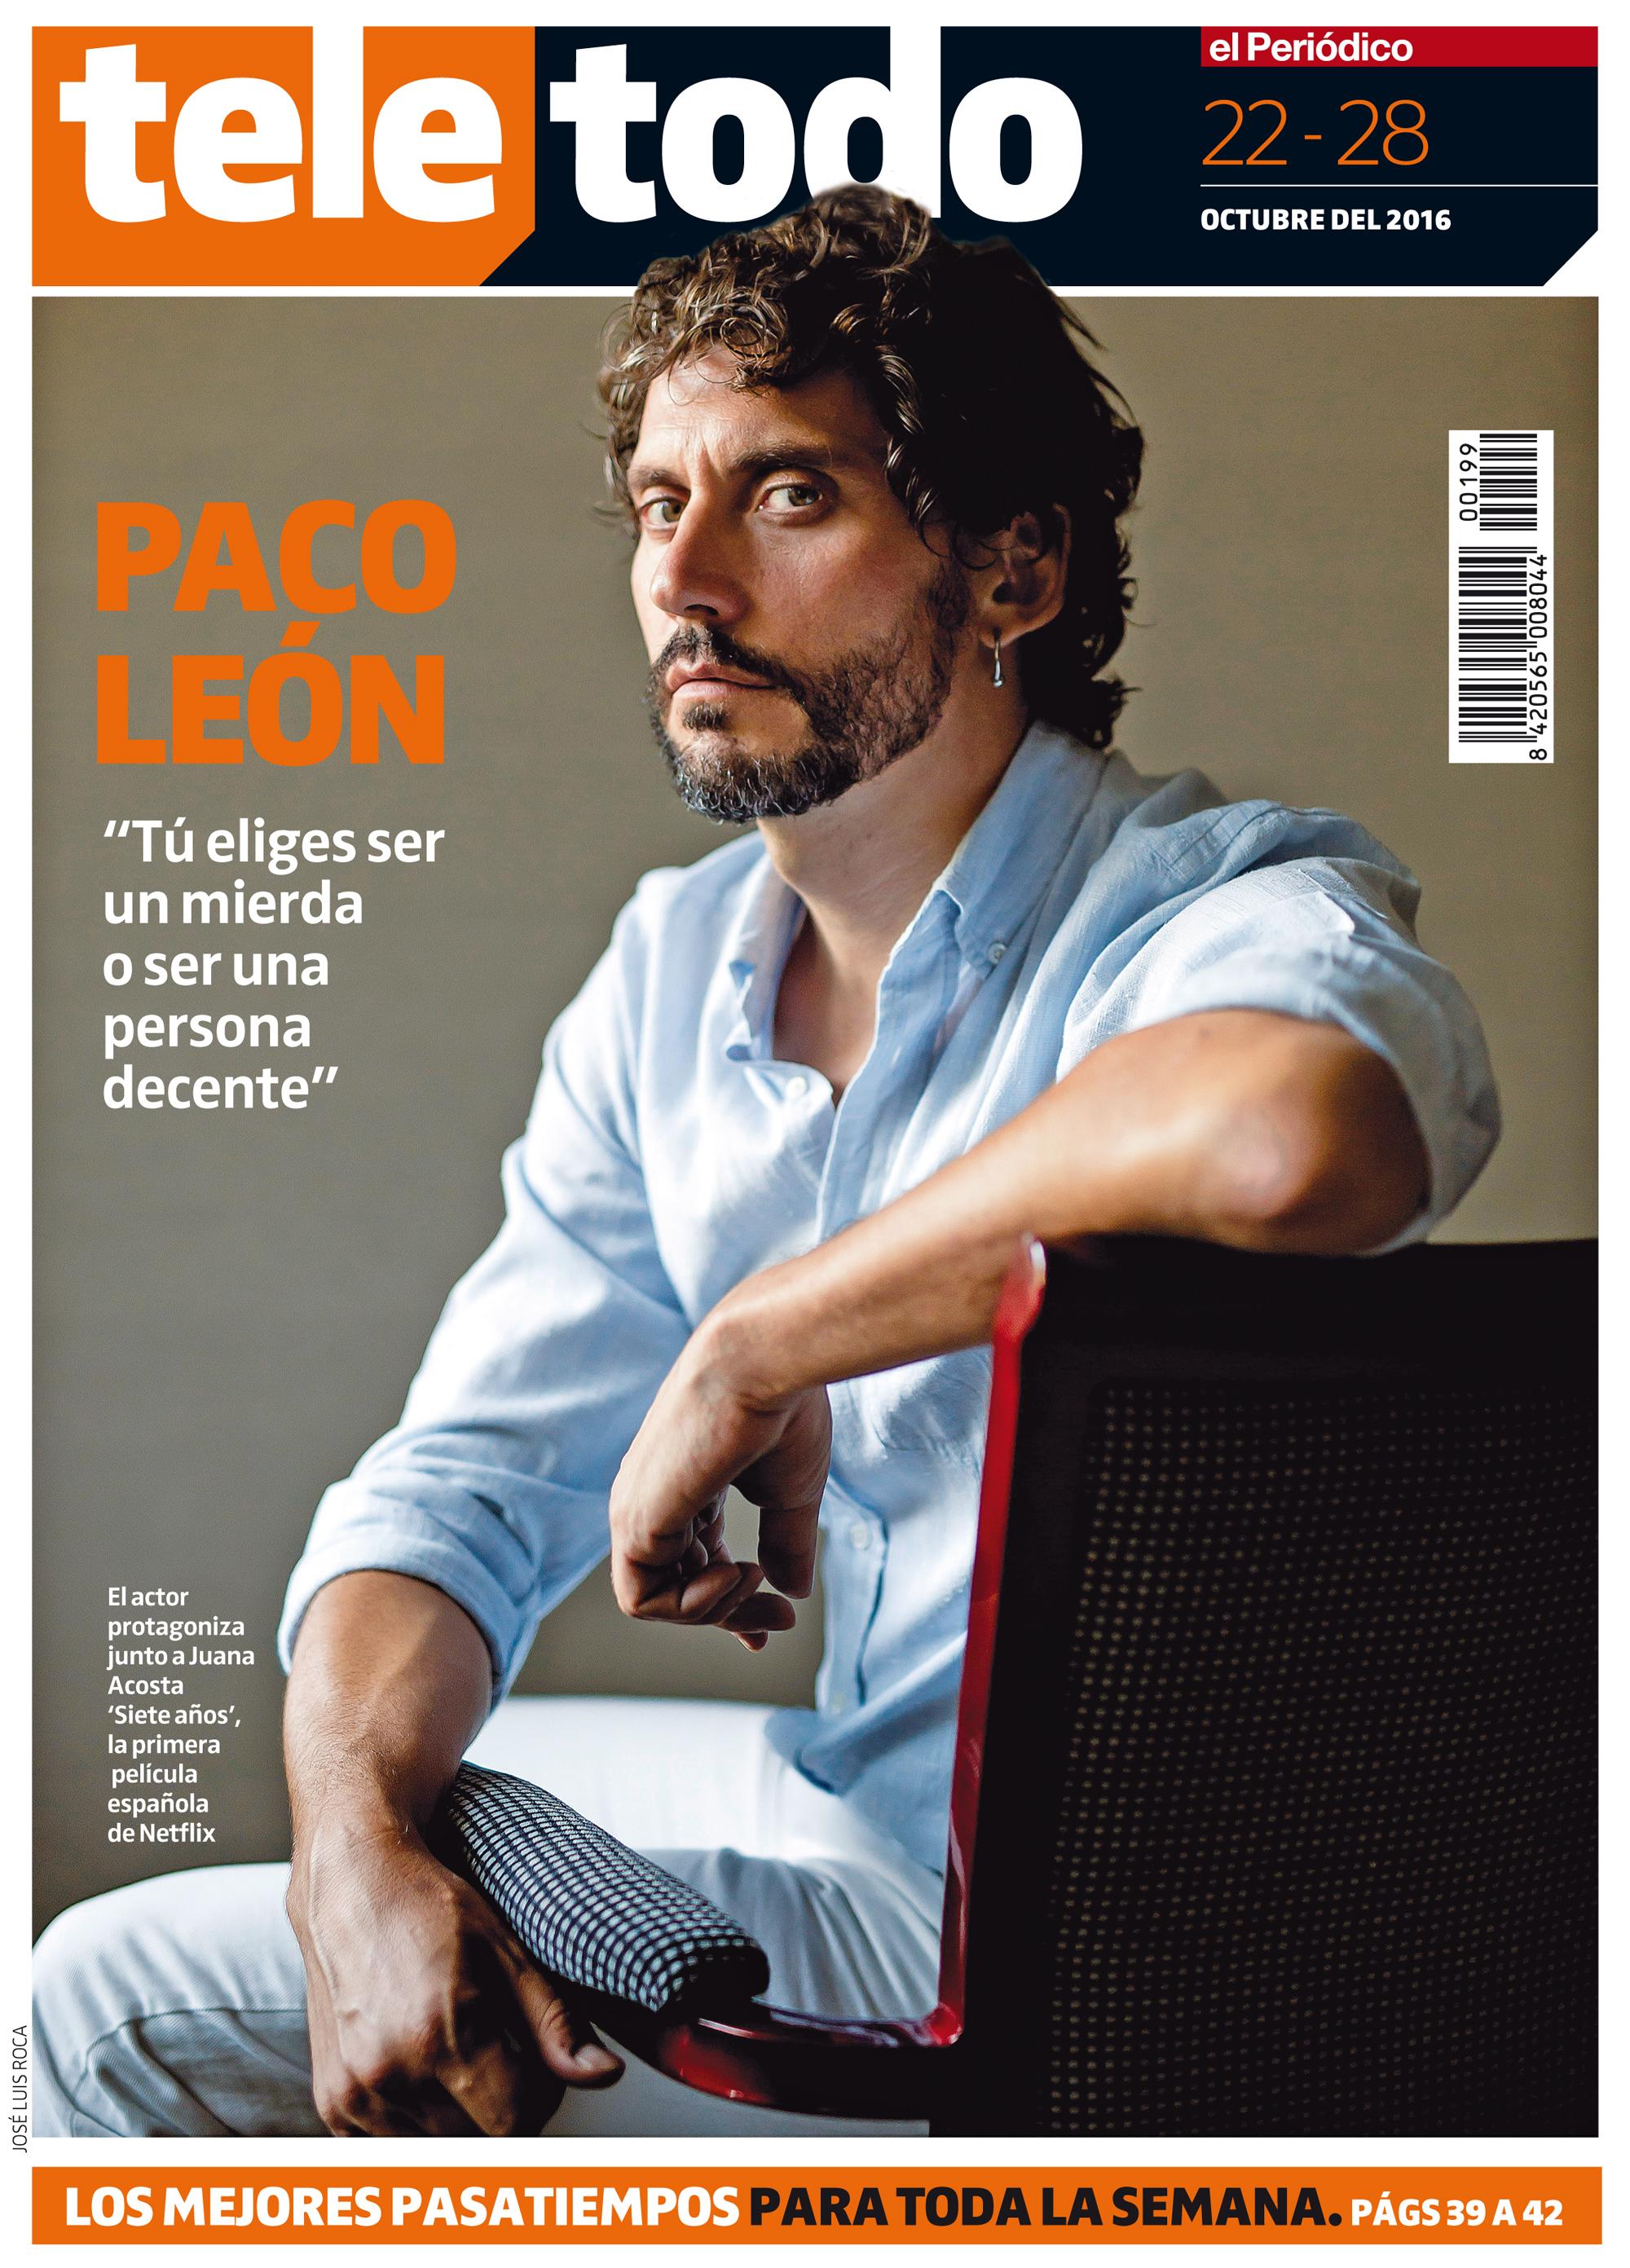 Paco Le�n pasa 'Siete a�os' en Netflix